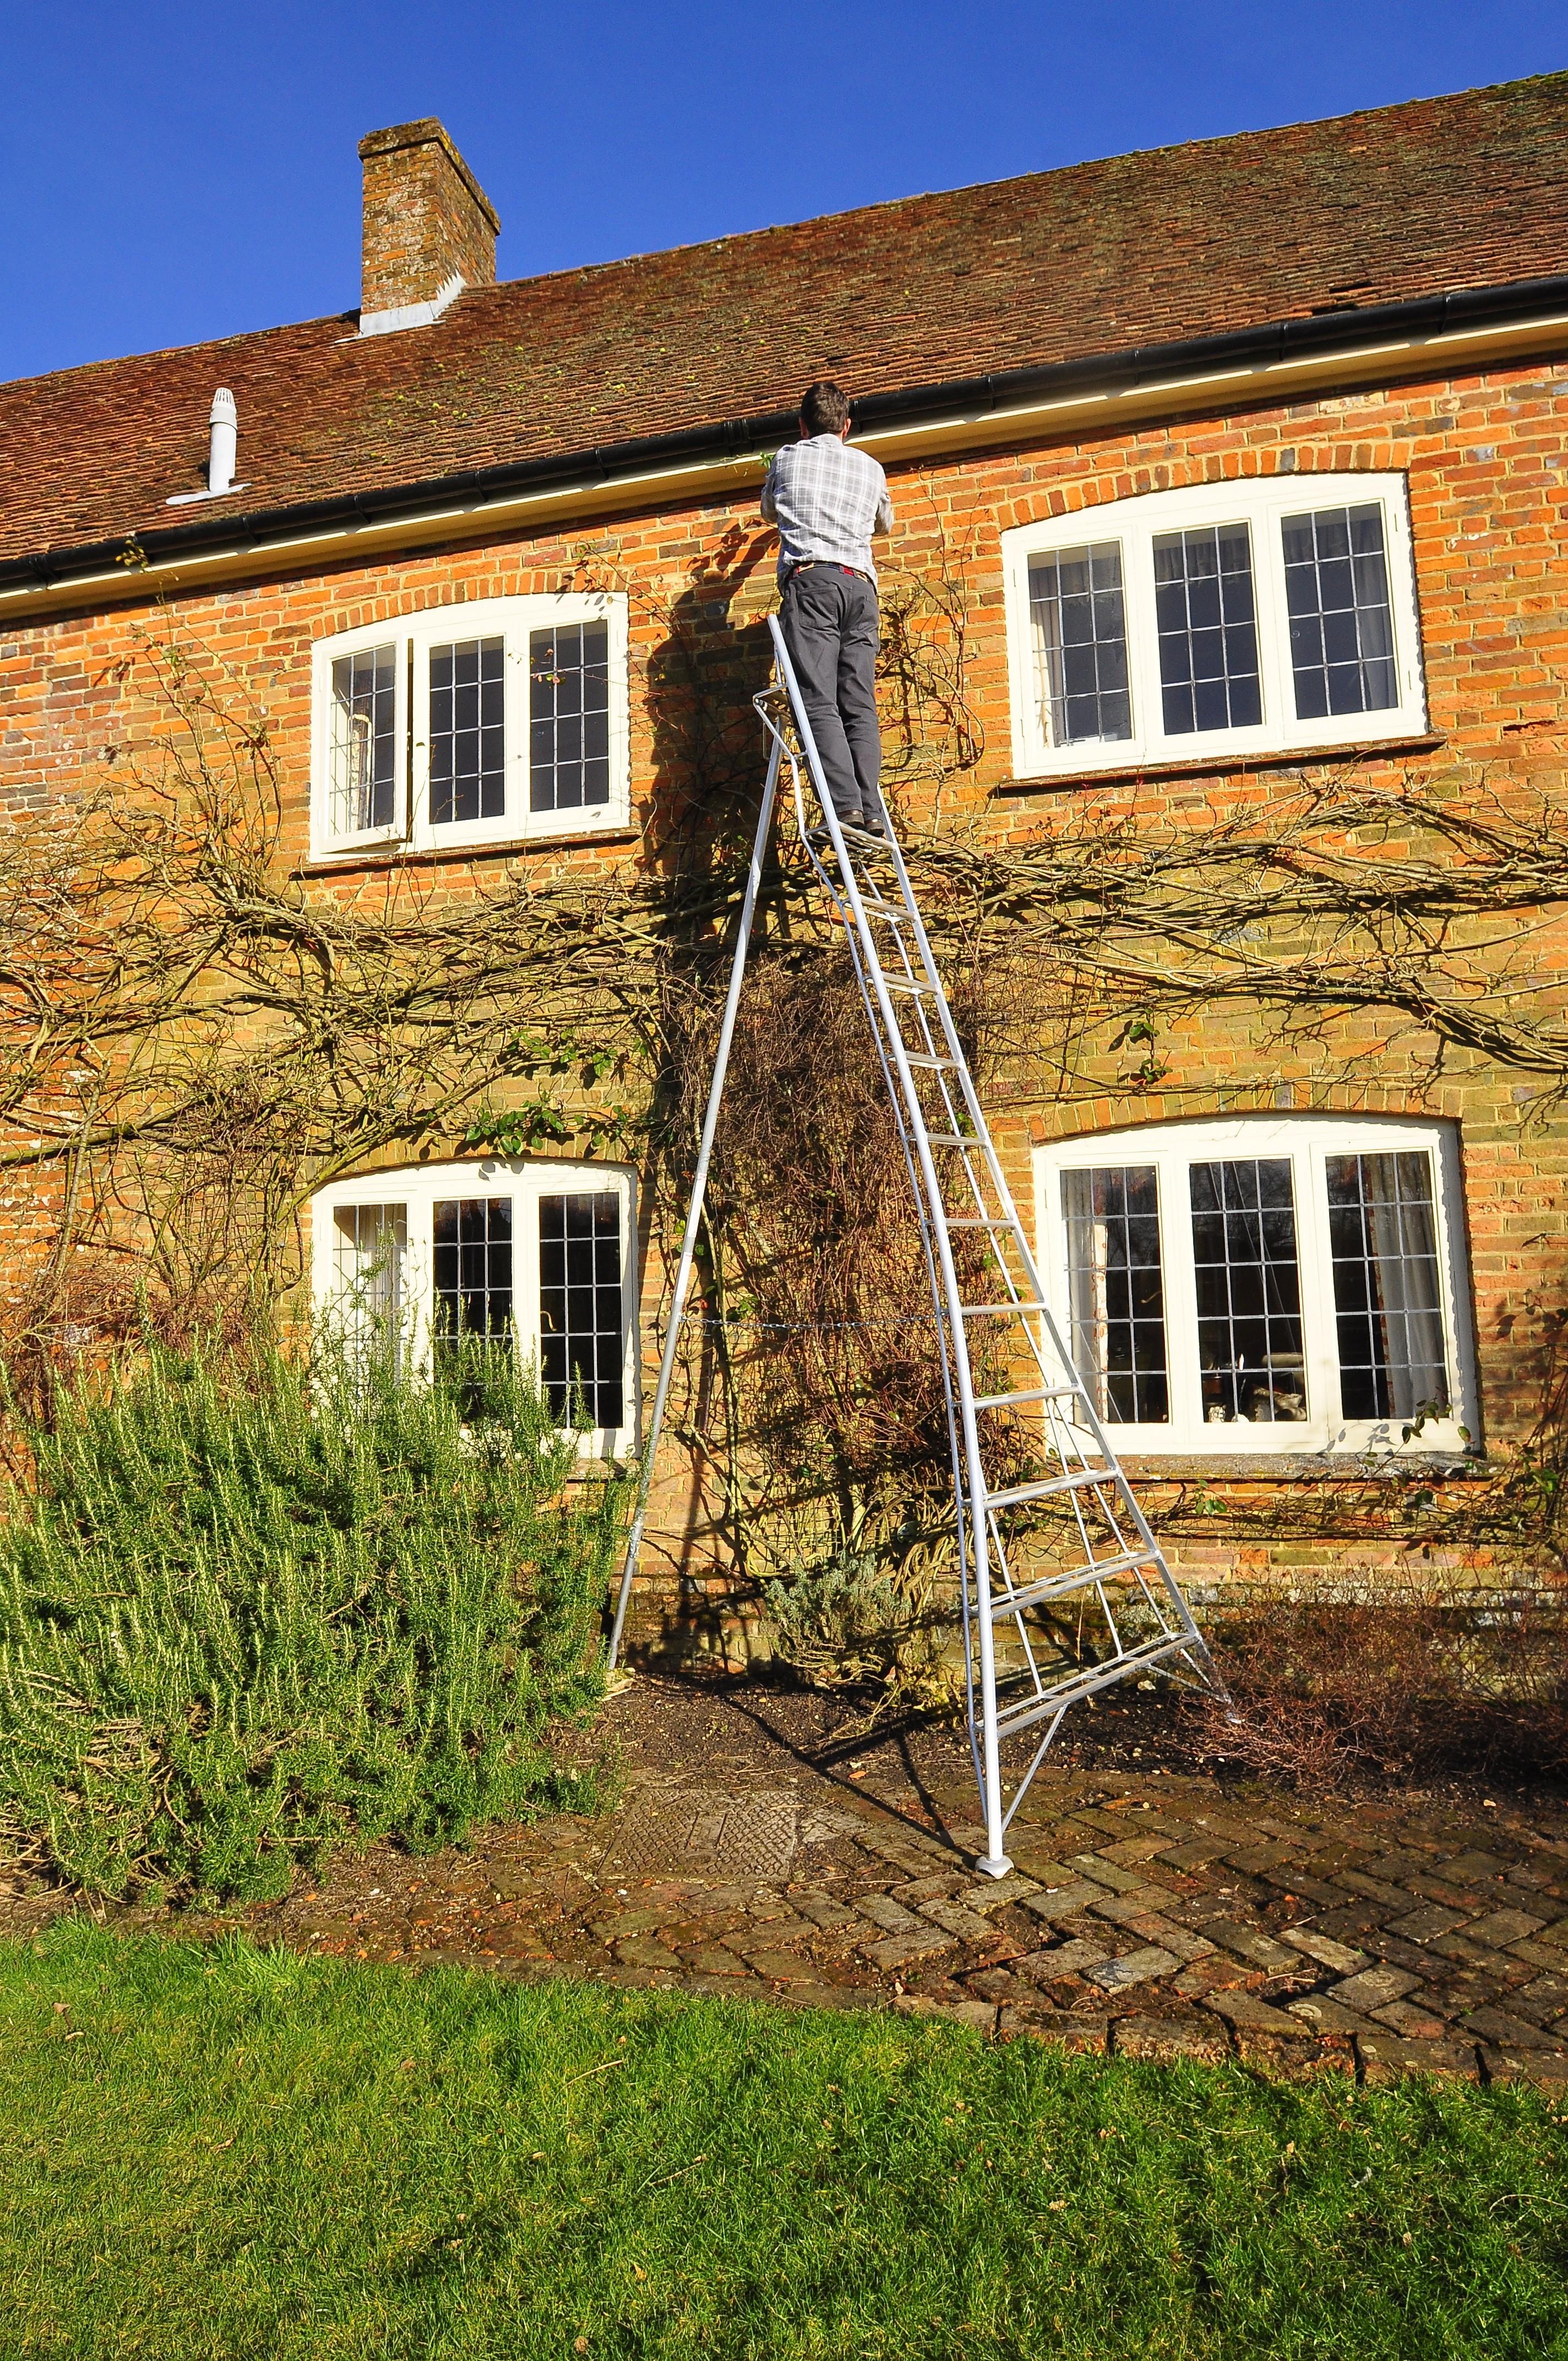 Henchman Platform Tripod Ladder - 1 Adjustable leg 10ft